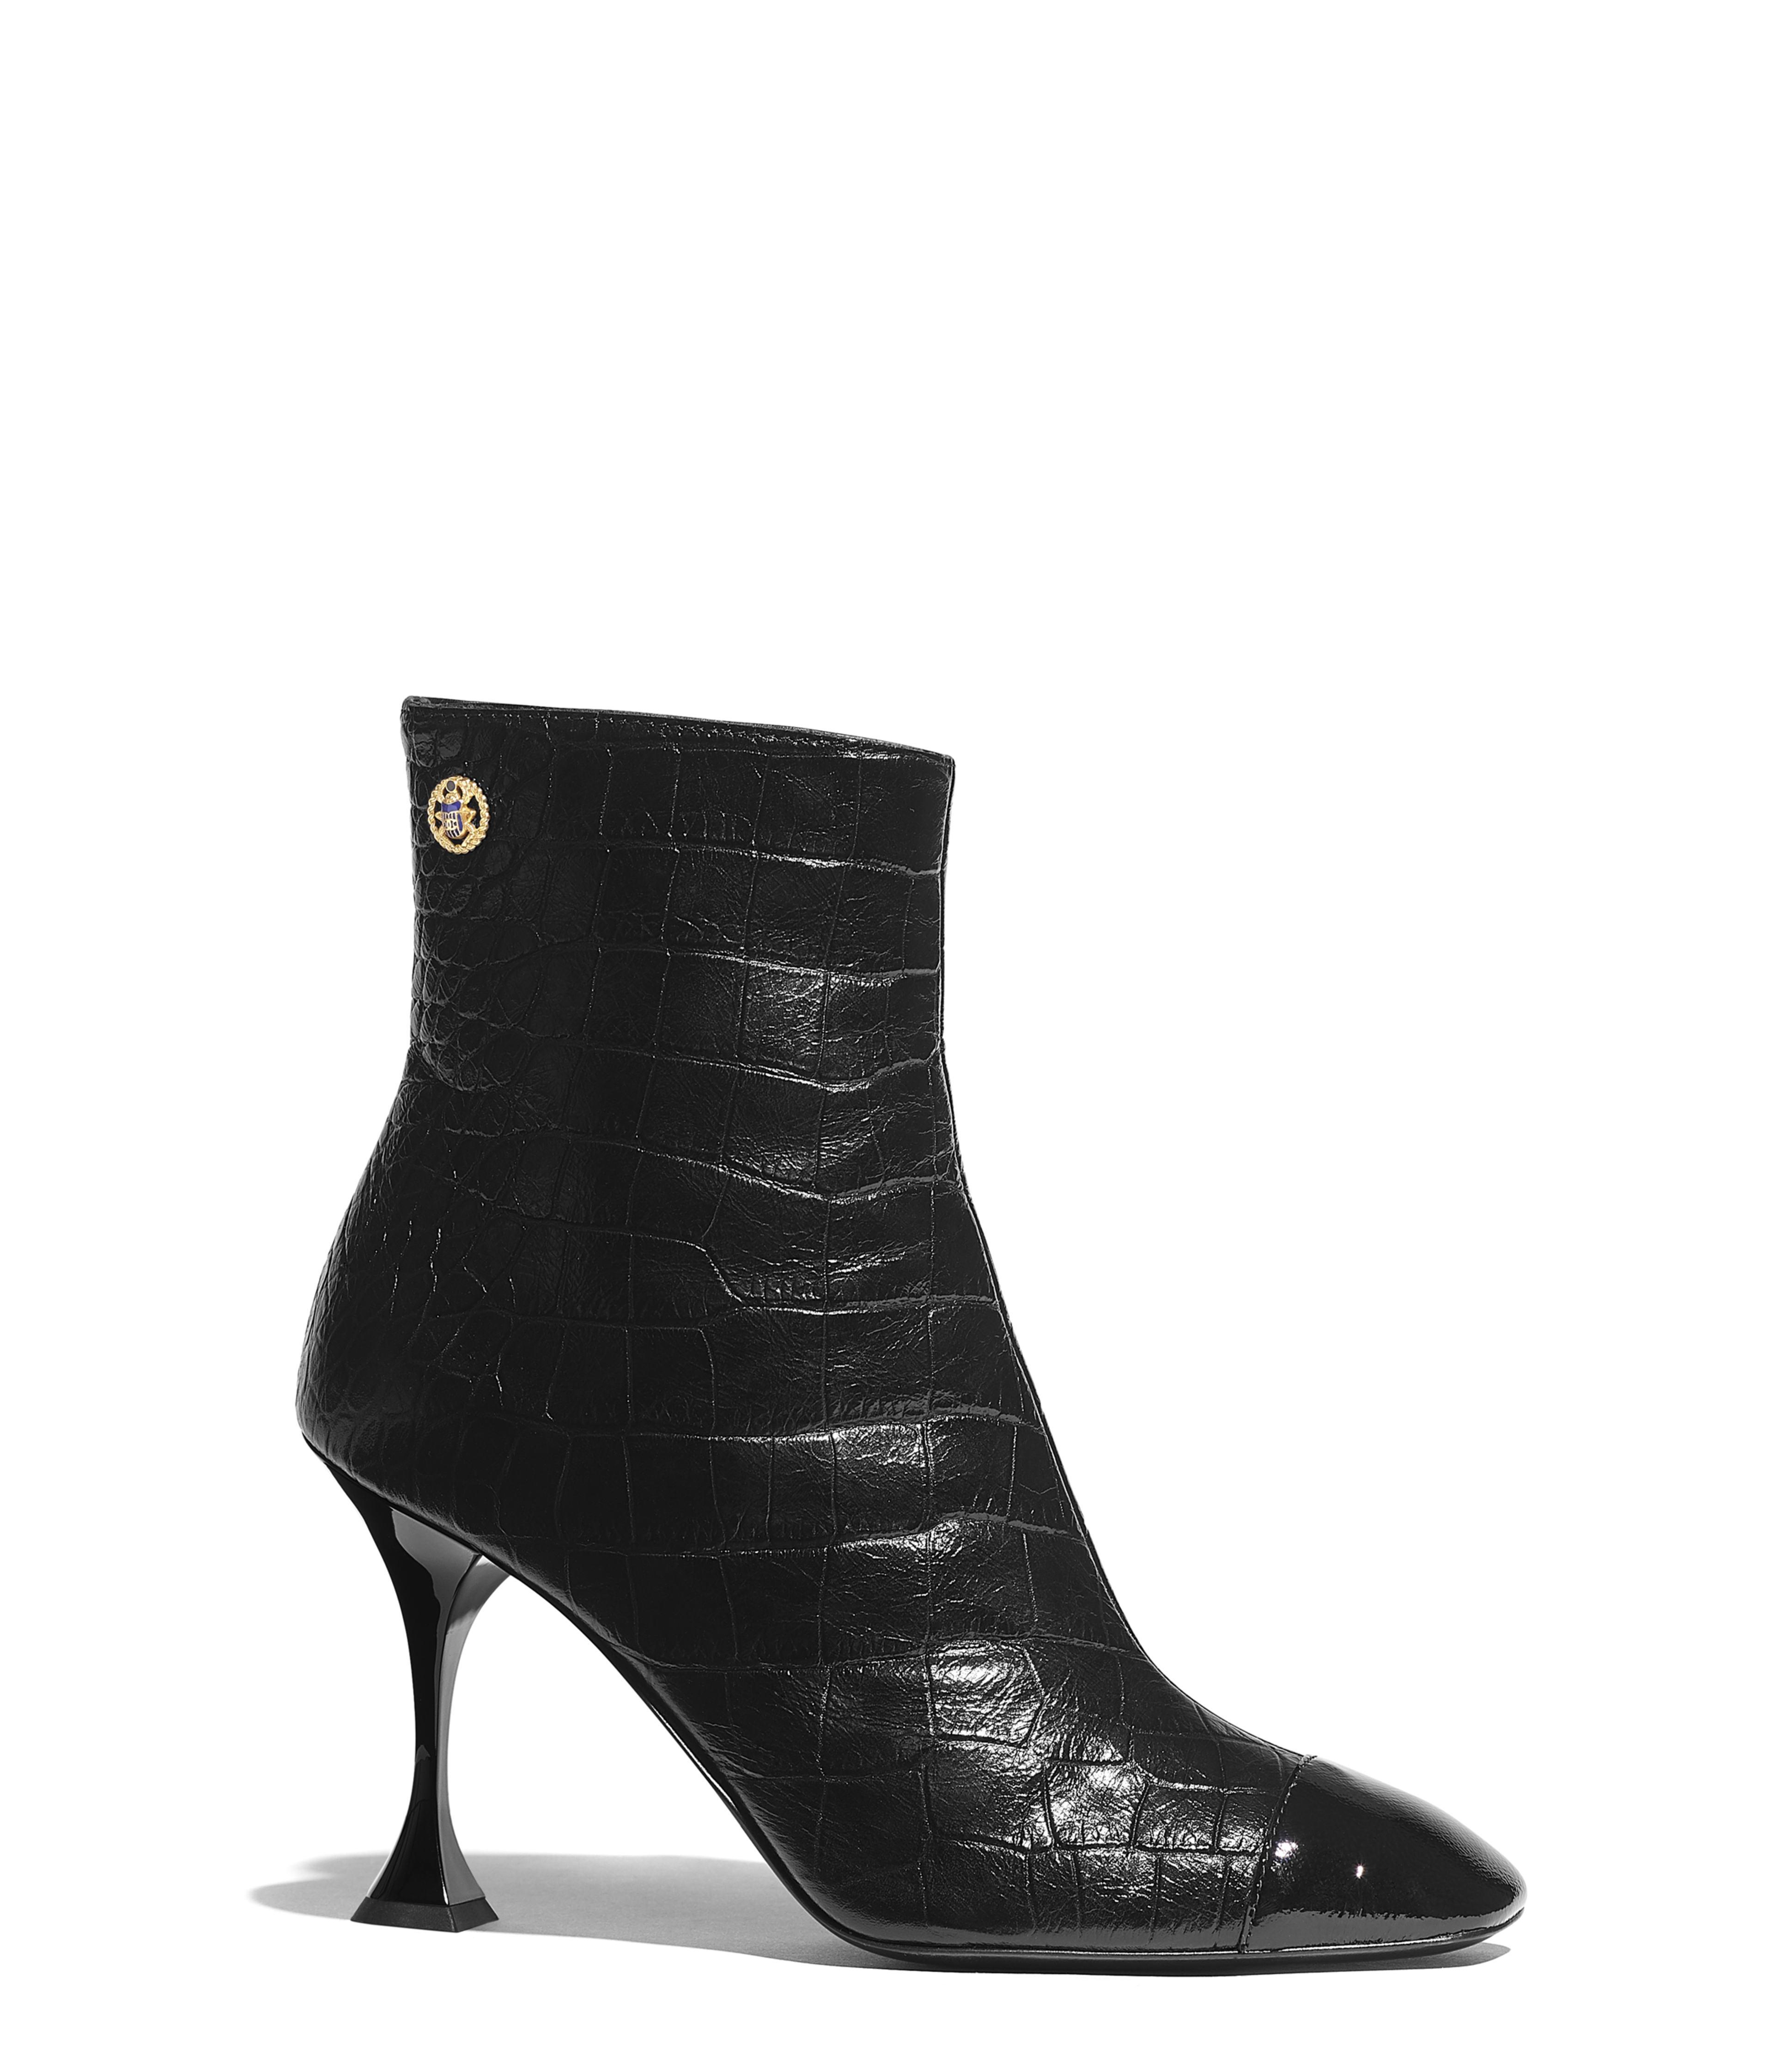 59ca610fa3dd4 Short Boots Embossed Matte Calfskin & Patent Crumpled Lambskin, Black Ref.  G34903Y5337794305